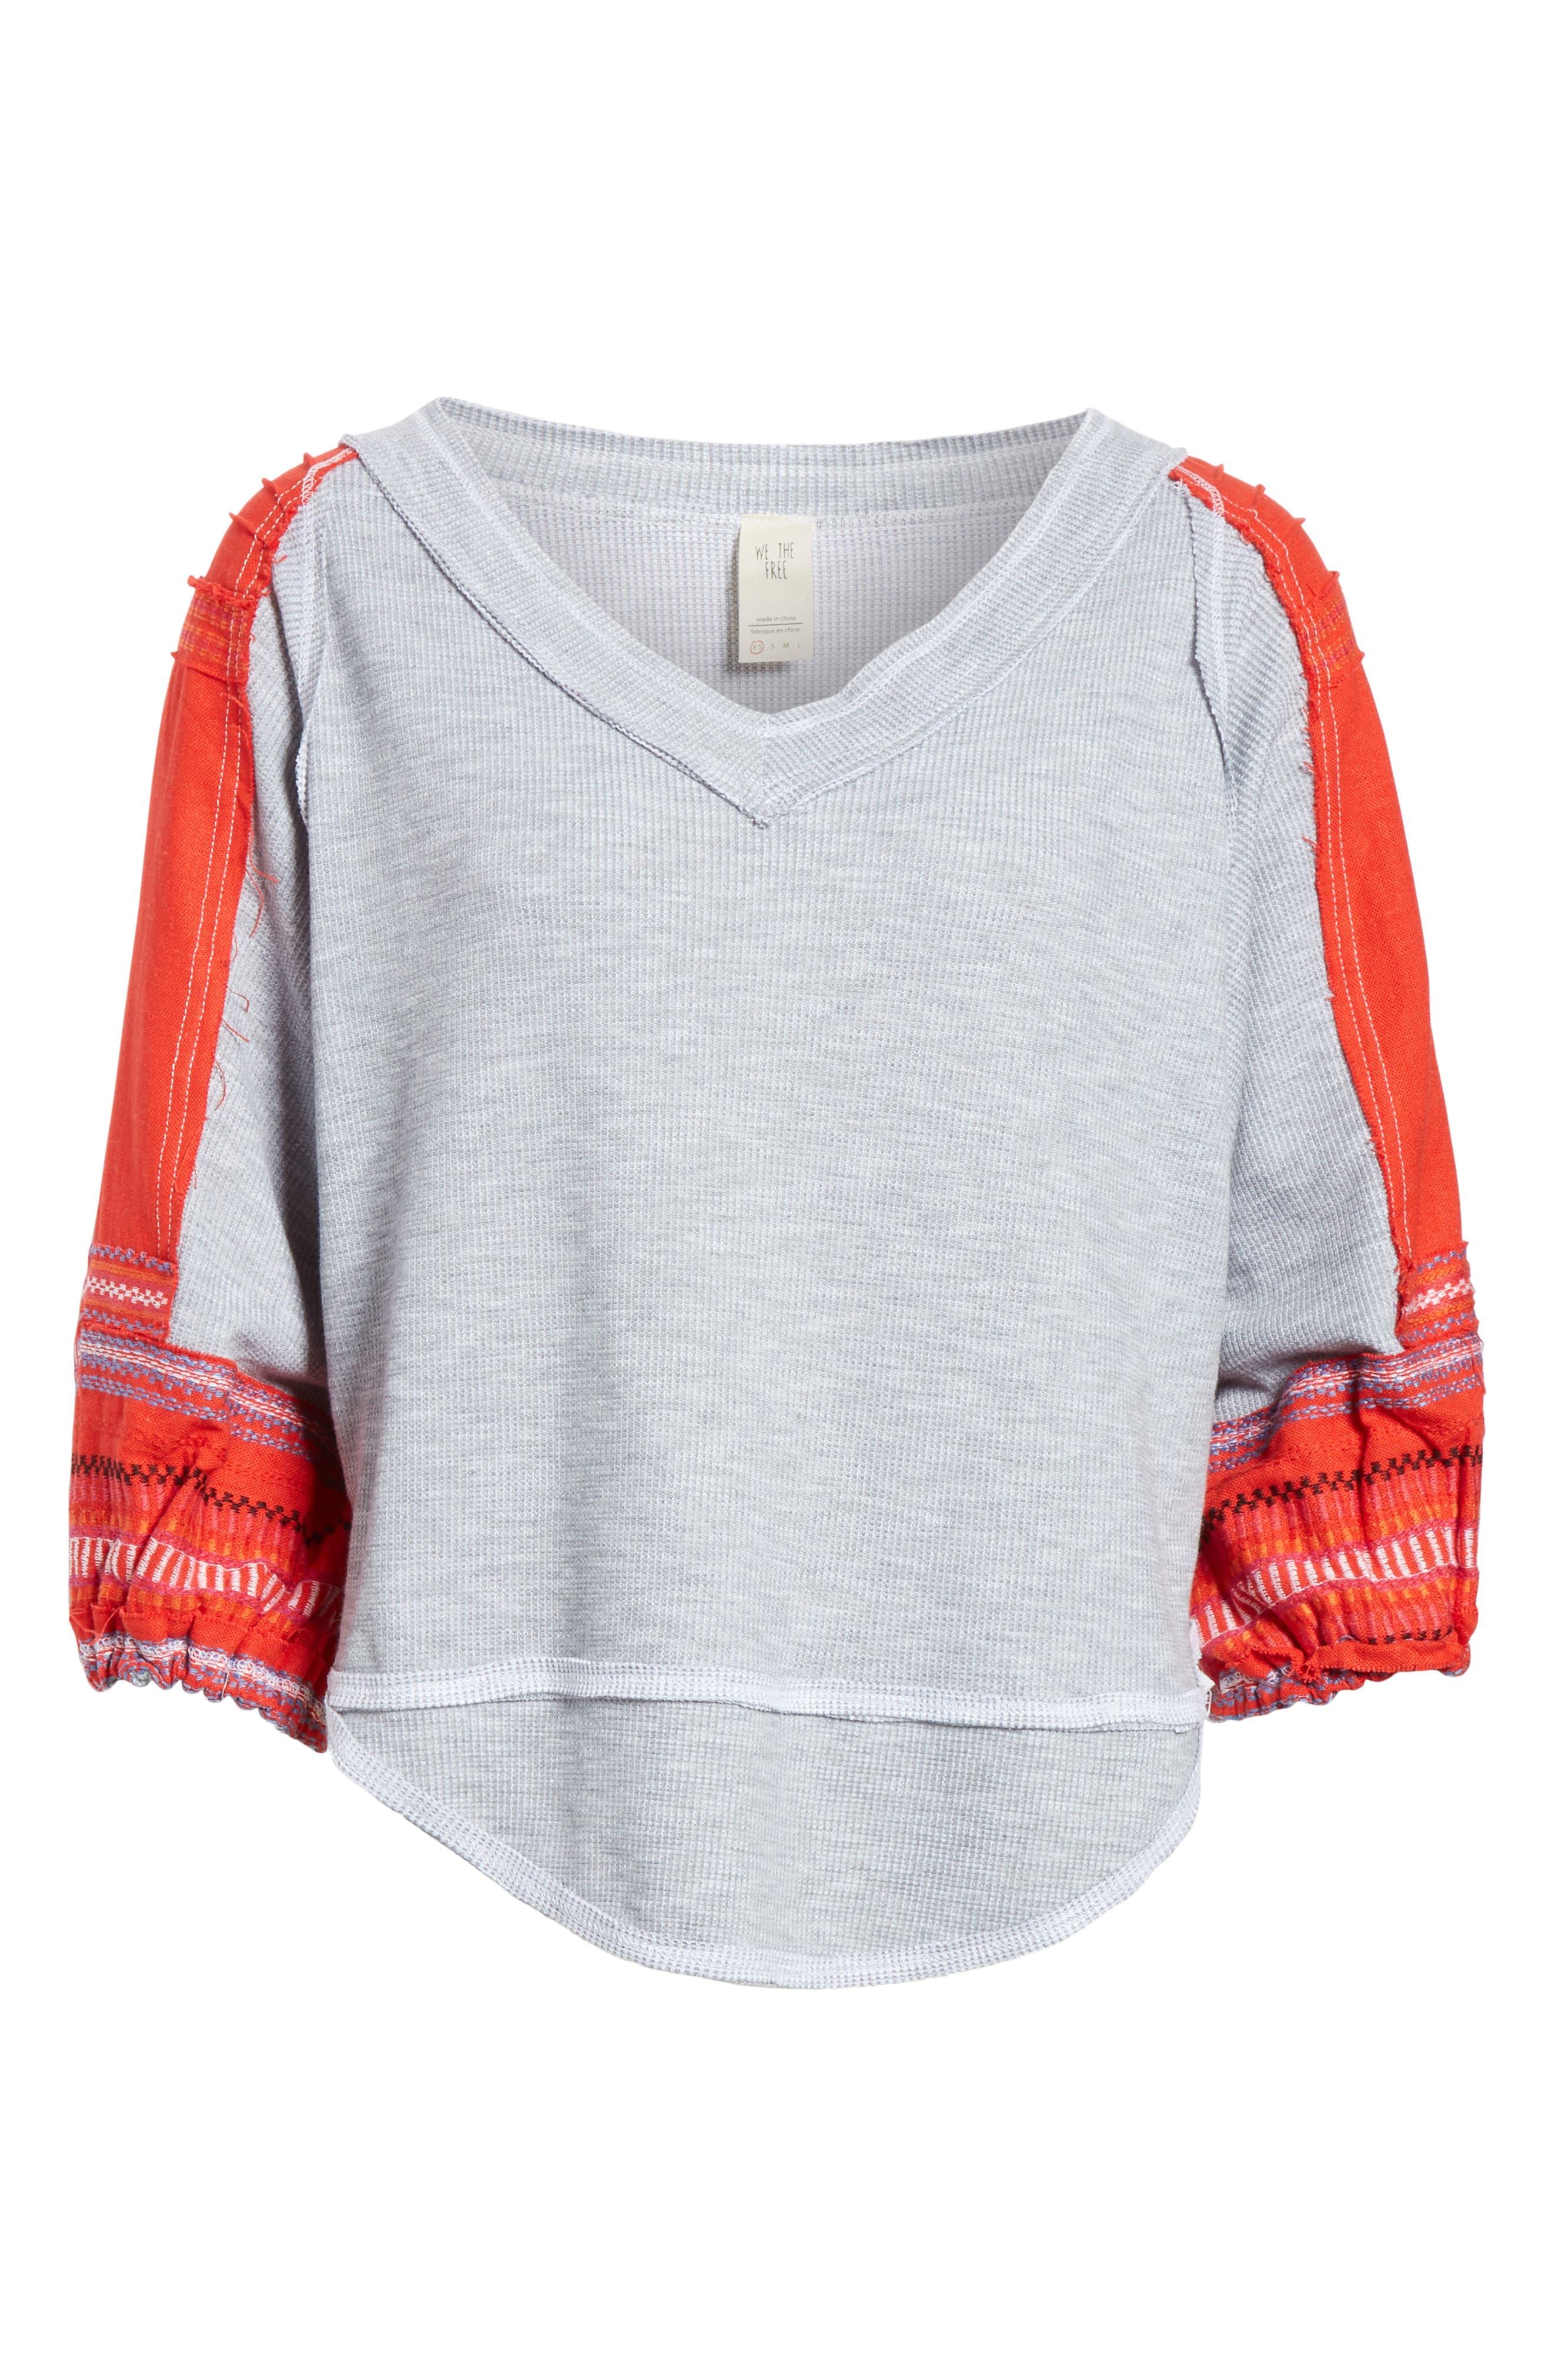 Bubble Shirt,                             Alternate thumbnail 6, color,                             030